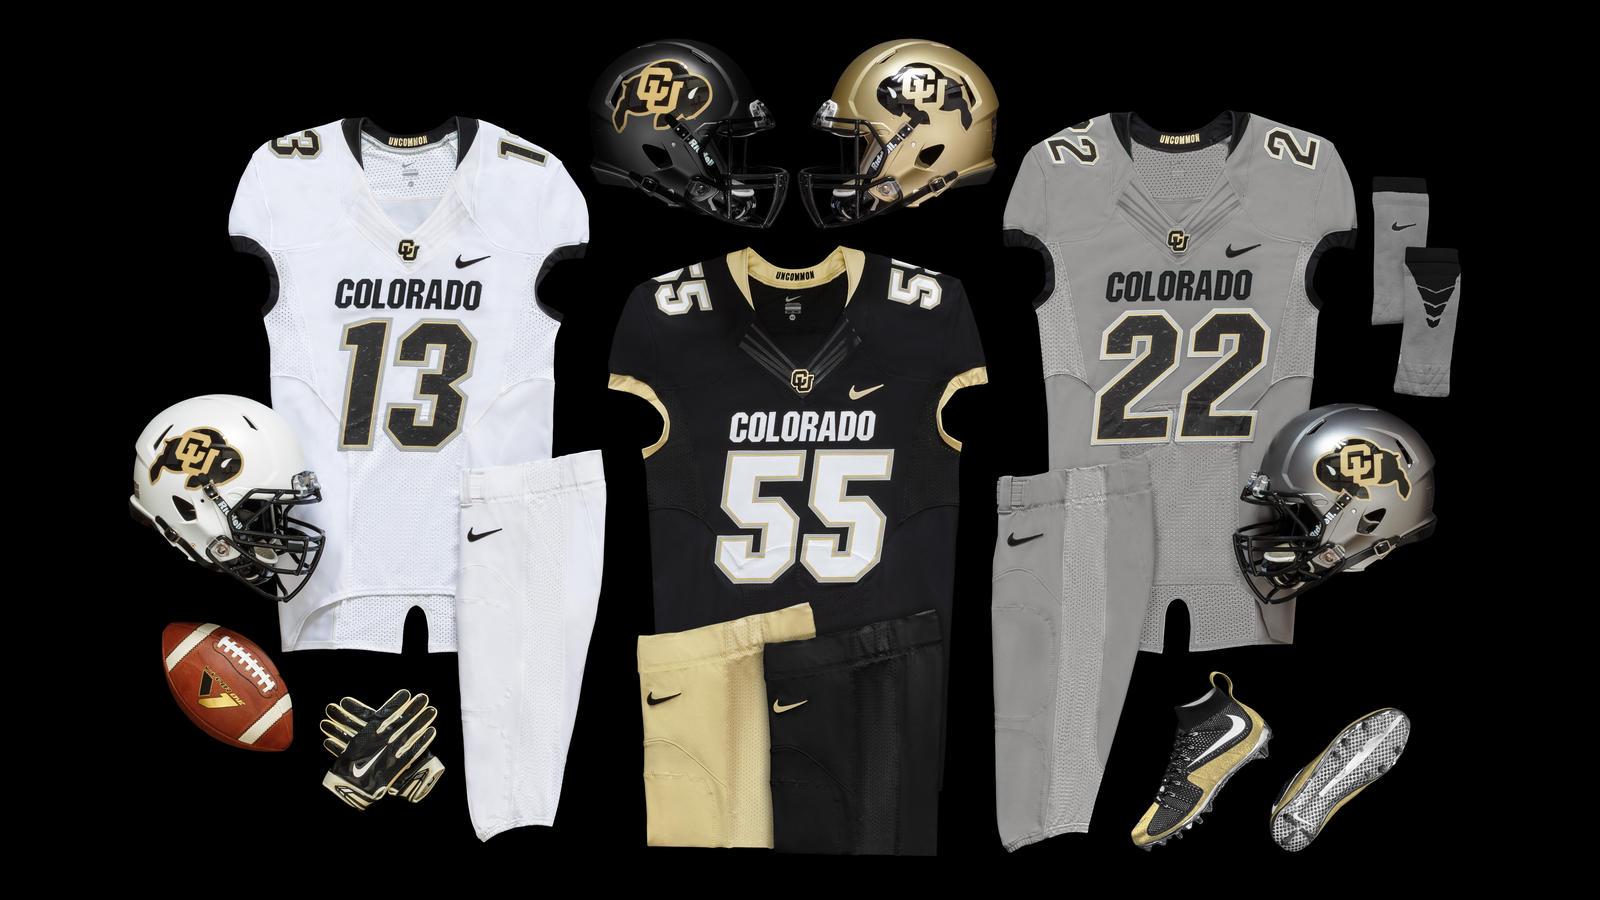 Colorado Buffaloes Honor Mascot With New Nike Football Uniform